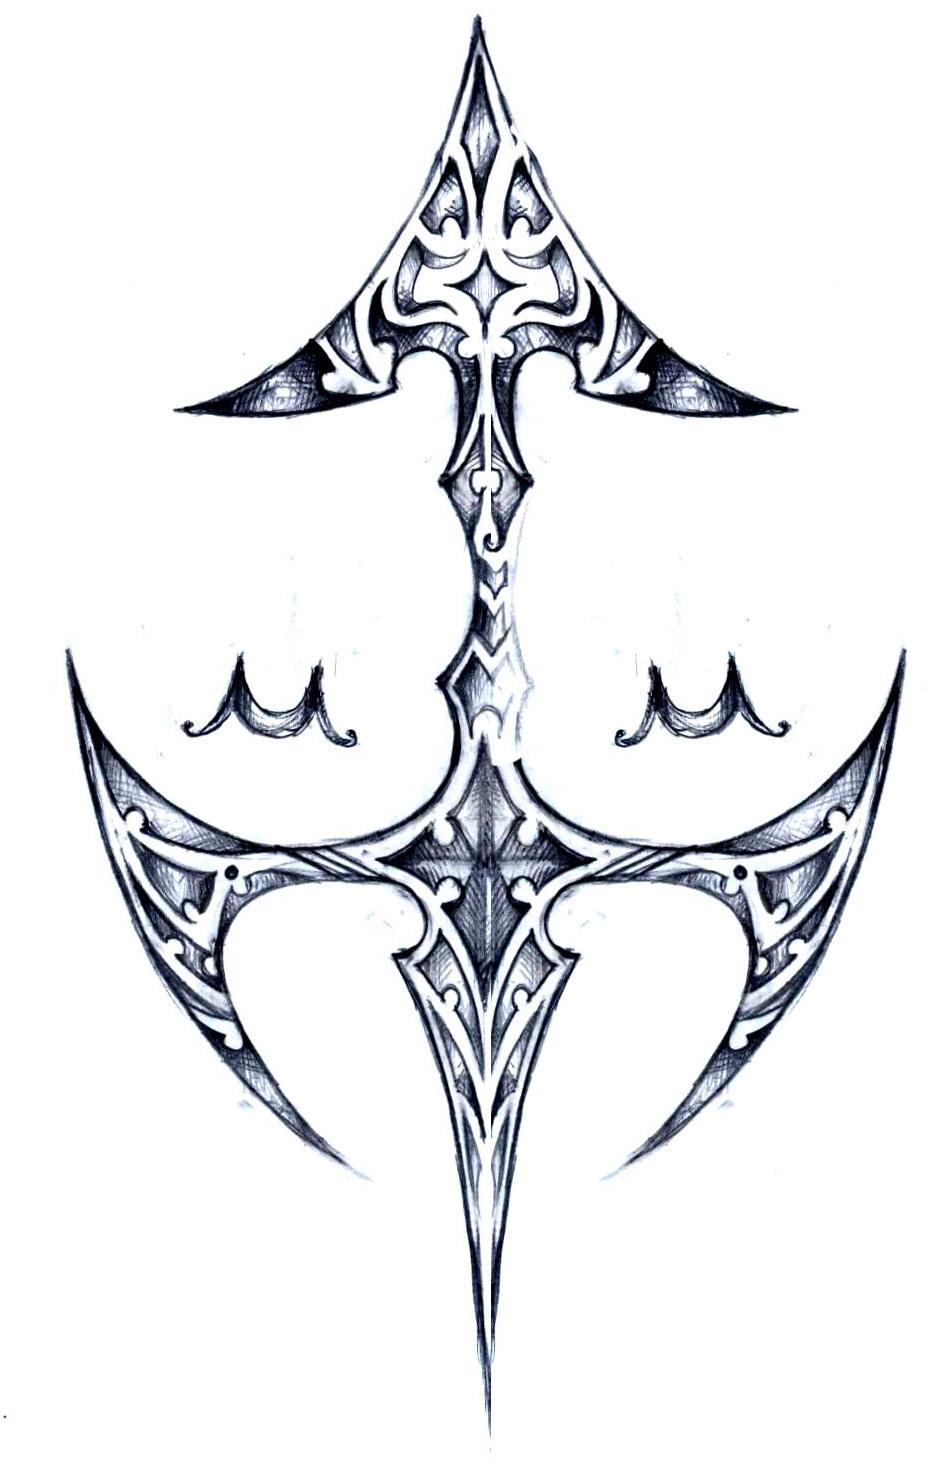 sagittarius zodiac sign tattoo sketch done by elenoosh on deviantart. Black Bedroom Furniture Sets. Home Design Ideas